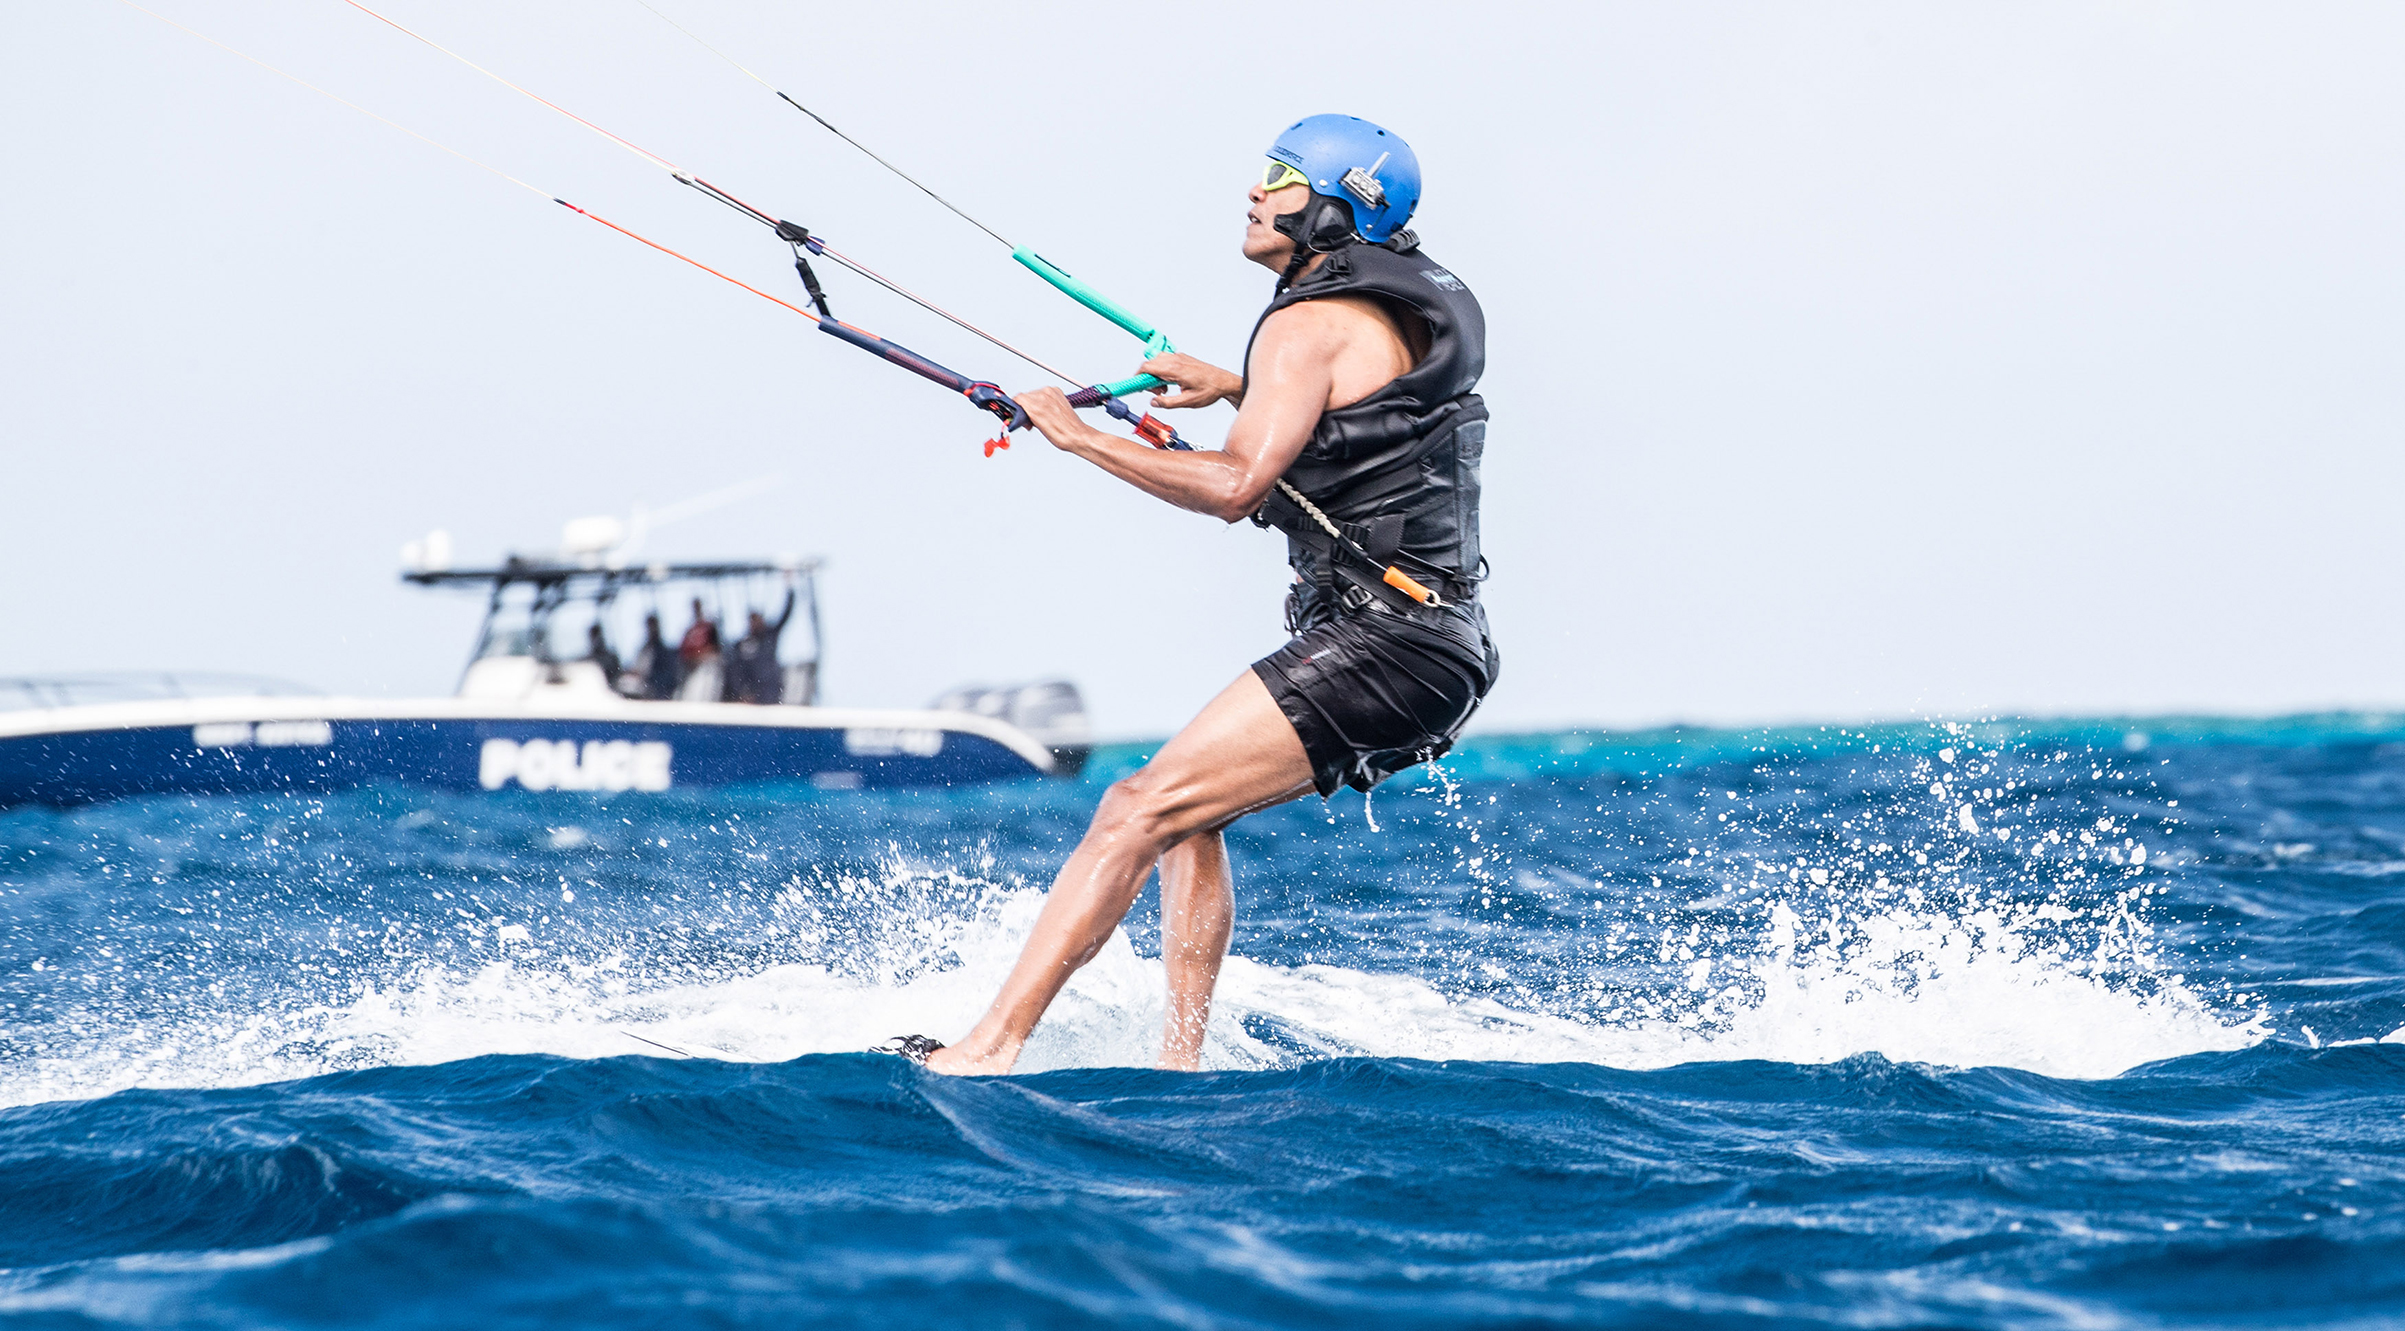 Former President Barack Obama kitesurfs at Richard Branson's Necker Island retreat on January 29, 2017 in the British Virgin Islands.